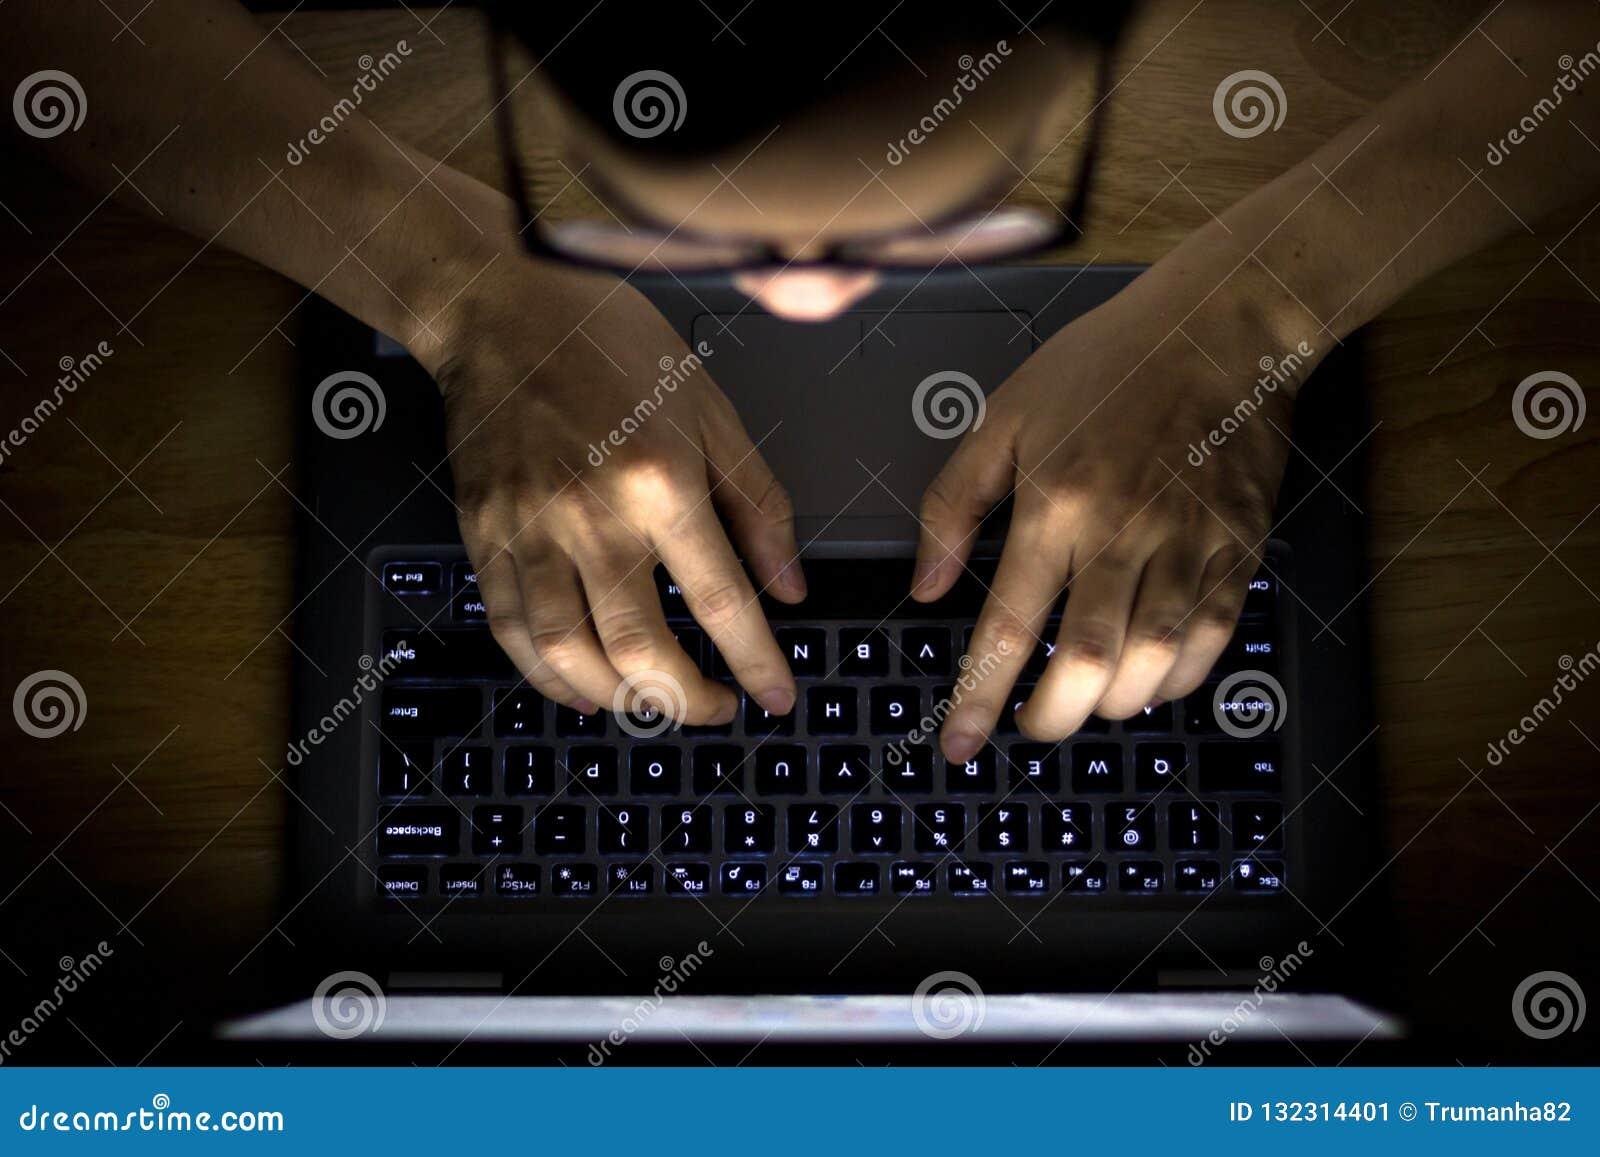 Man Using Laptop in The Dark